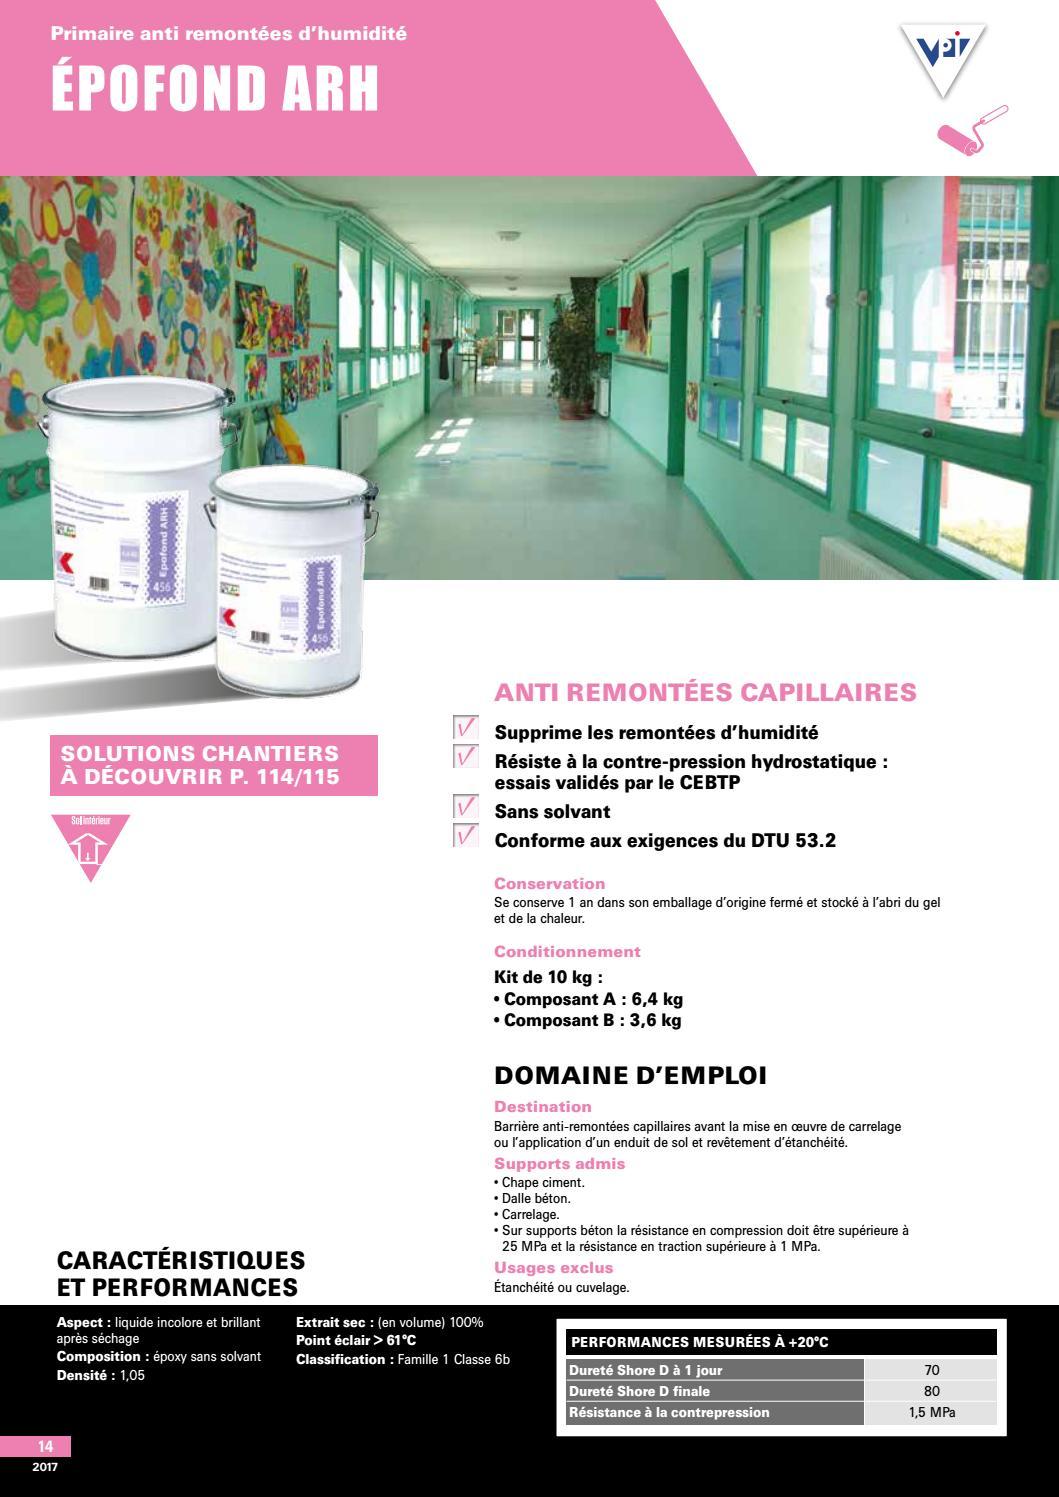 Humidite Qui Remonte Par Le Carrelage ft-epofond-arh2017bigmatfrance - issuu